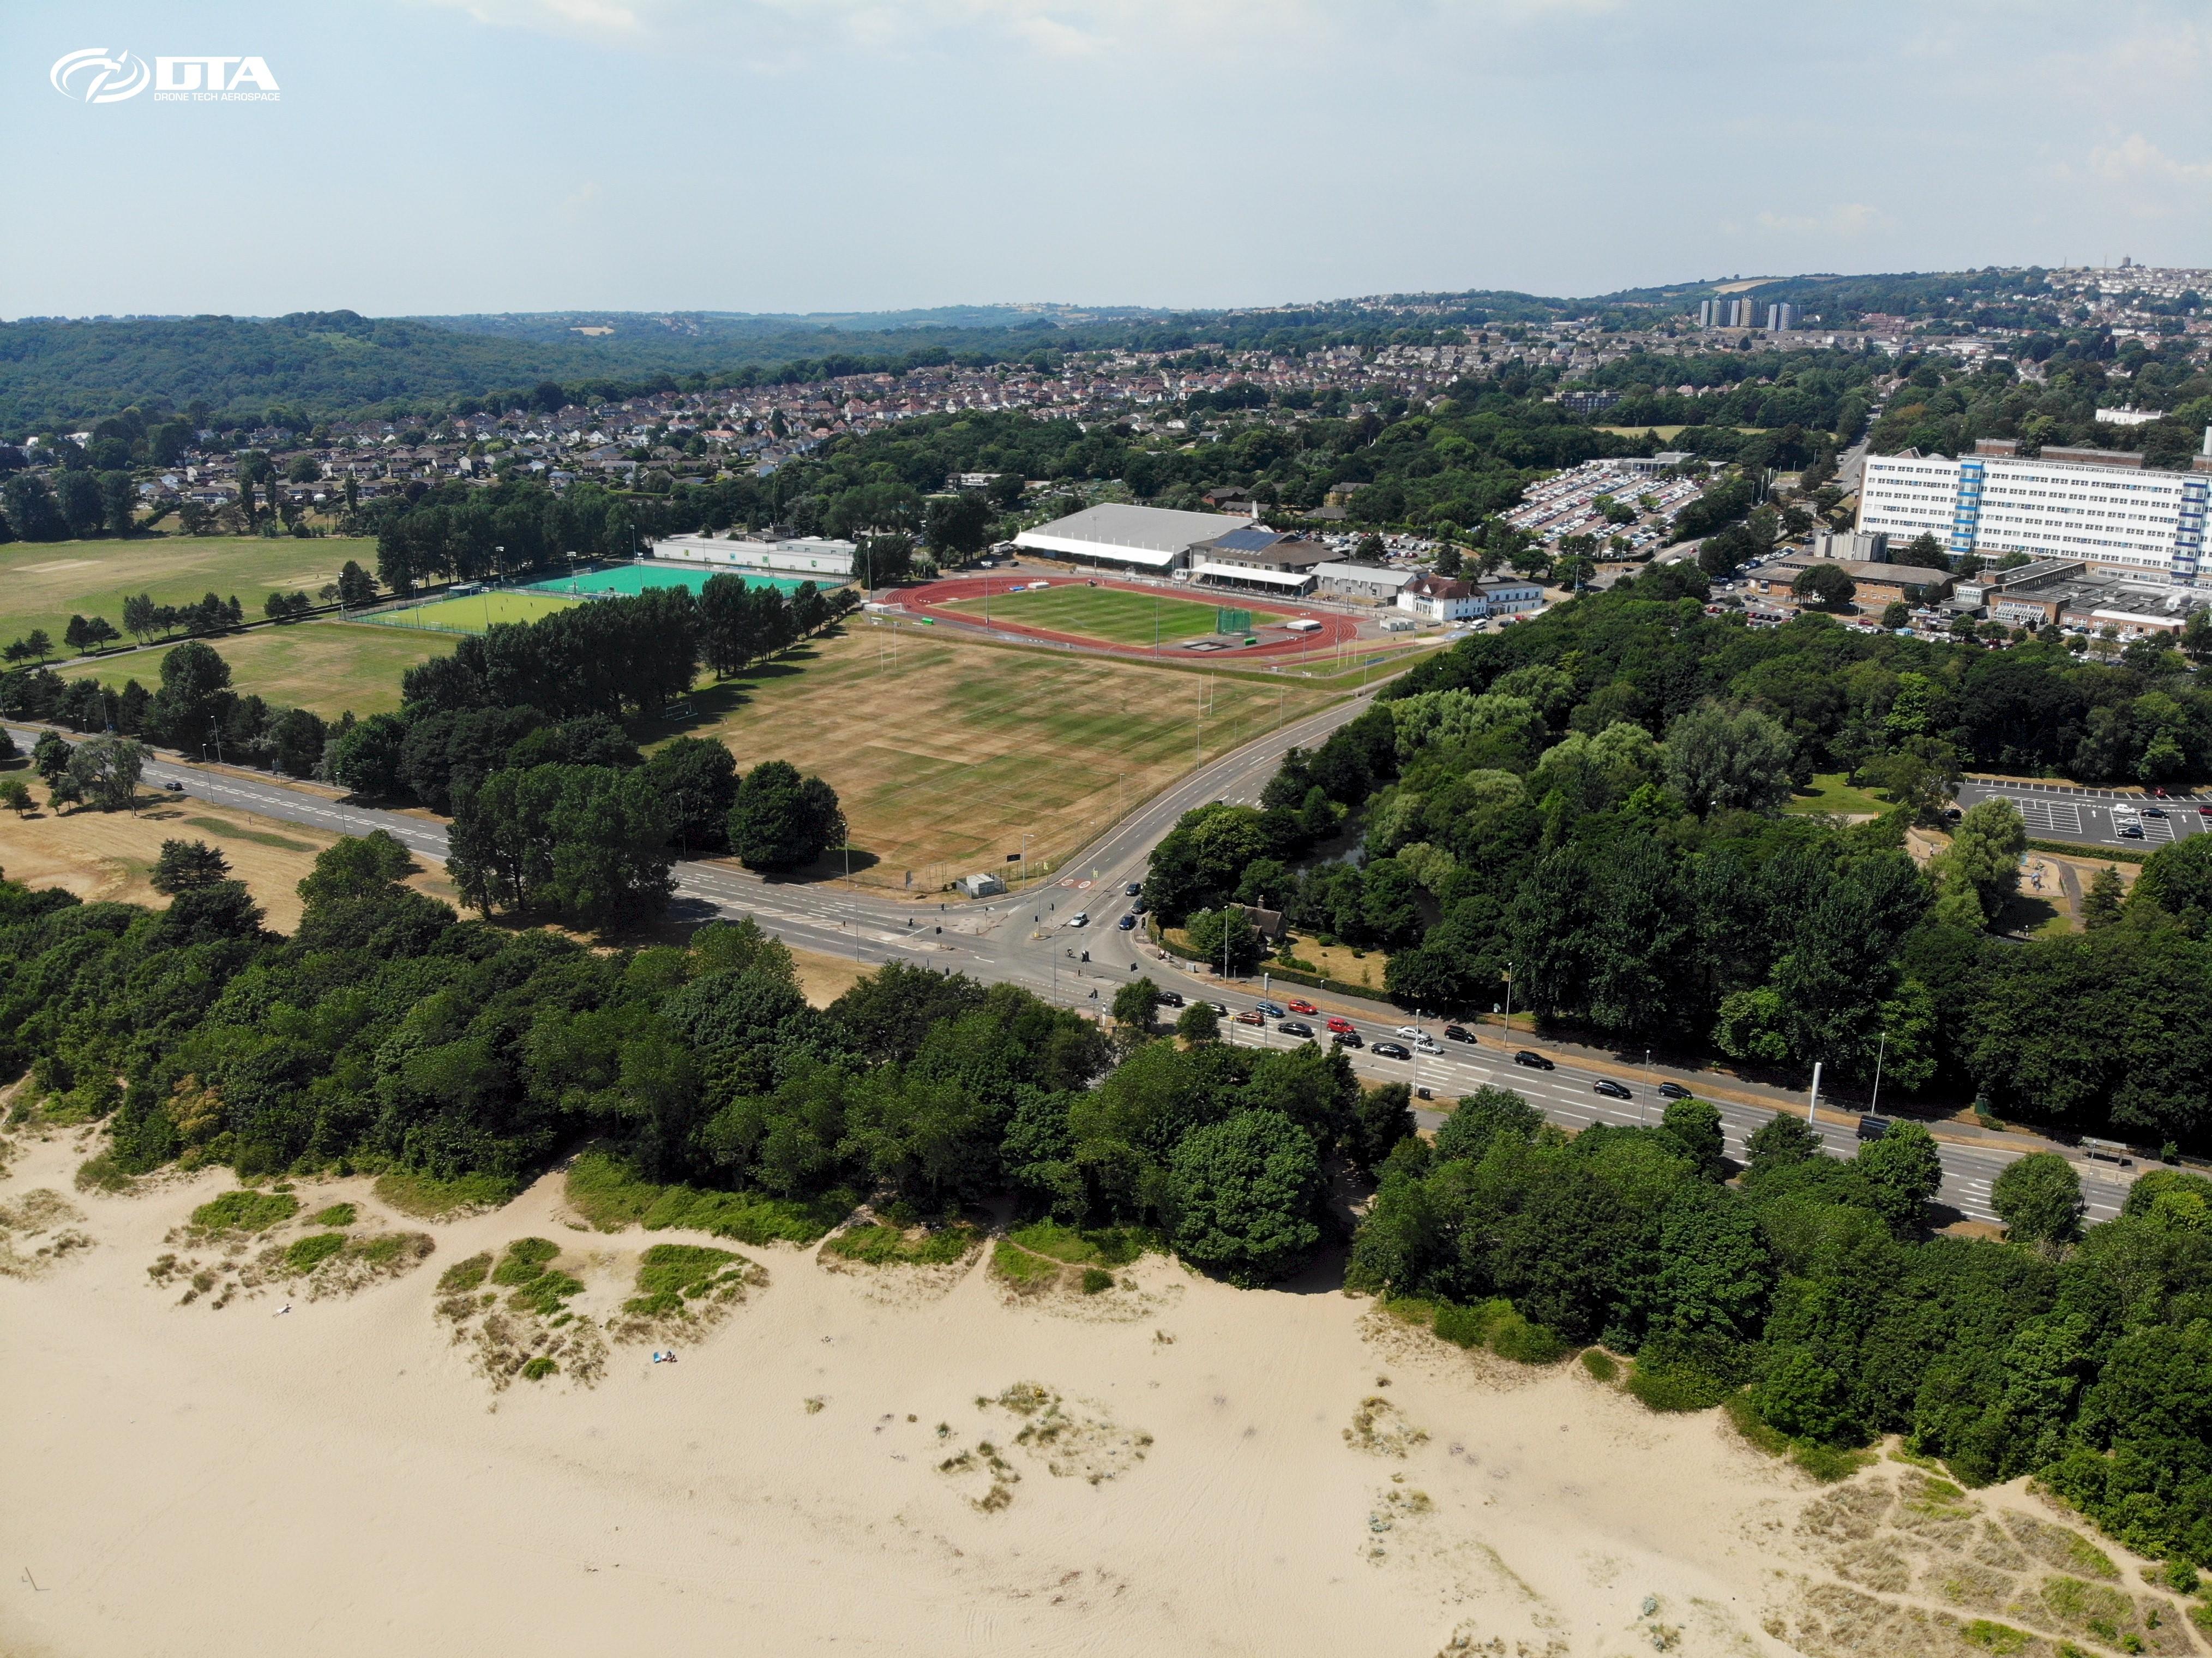 Swansea Bay University Sports Grounds